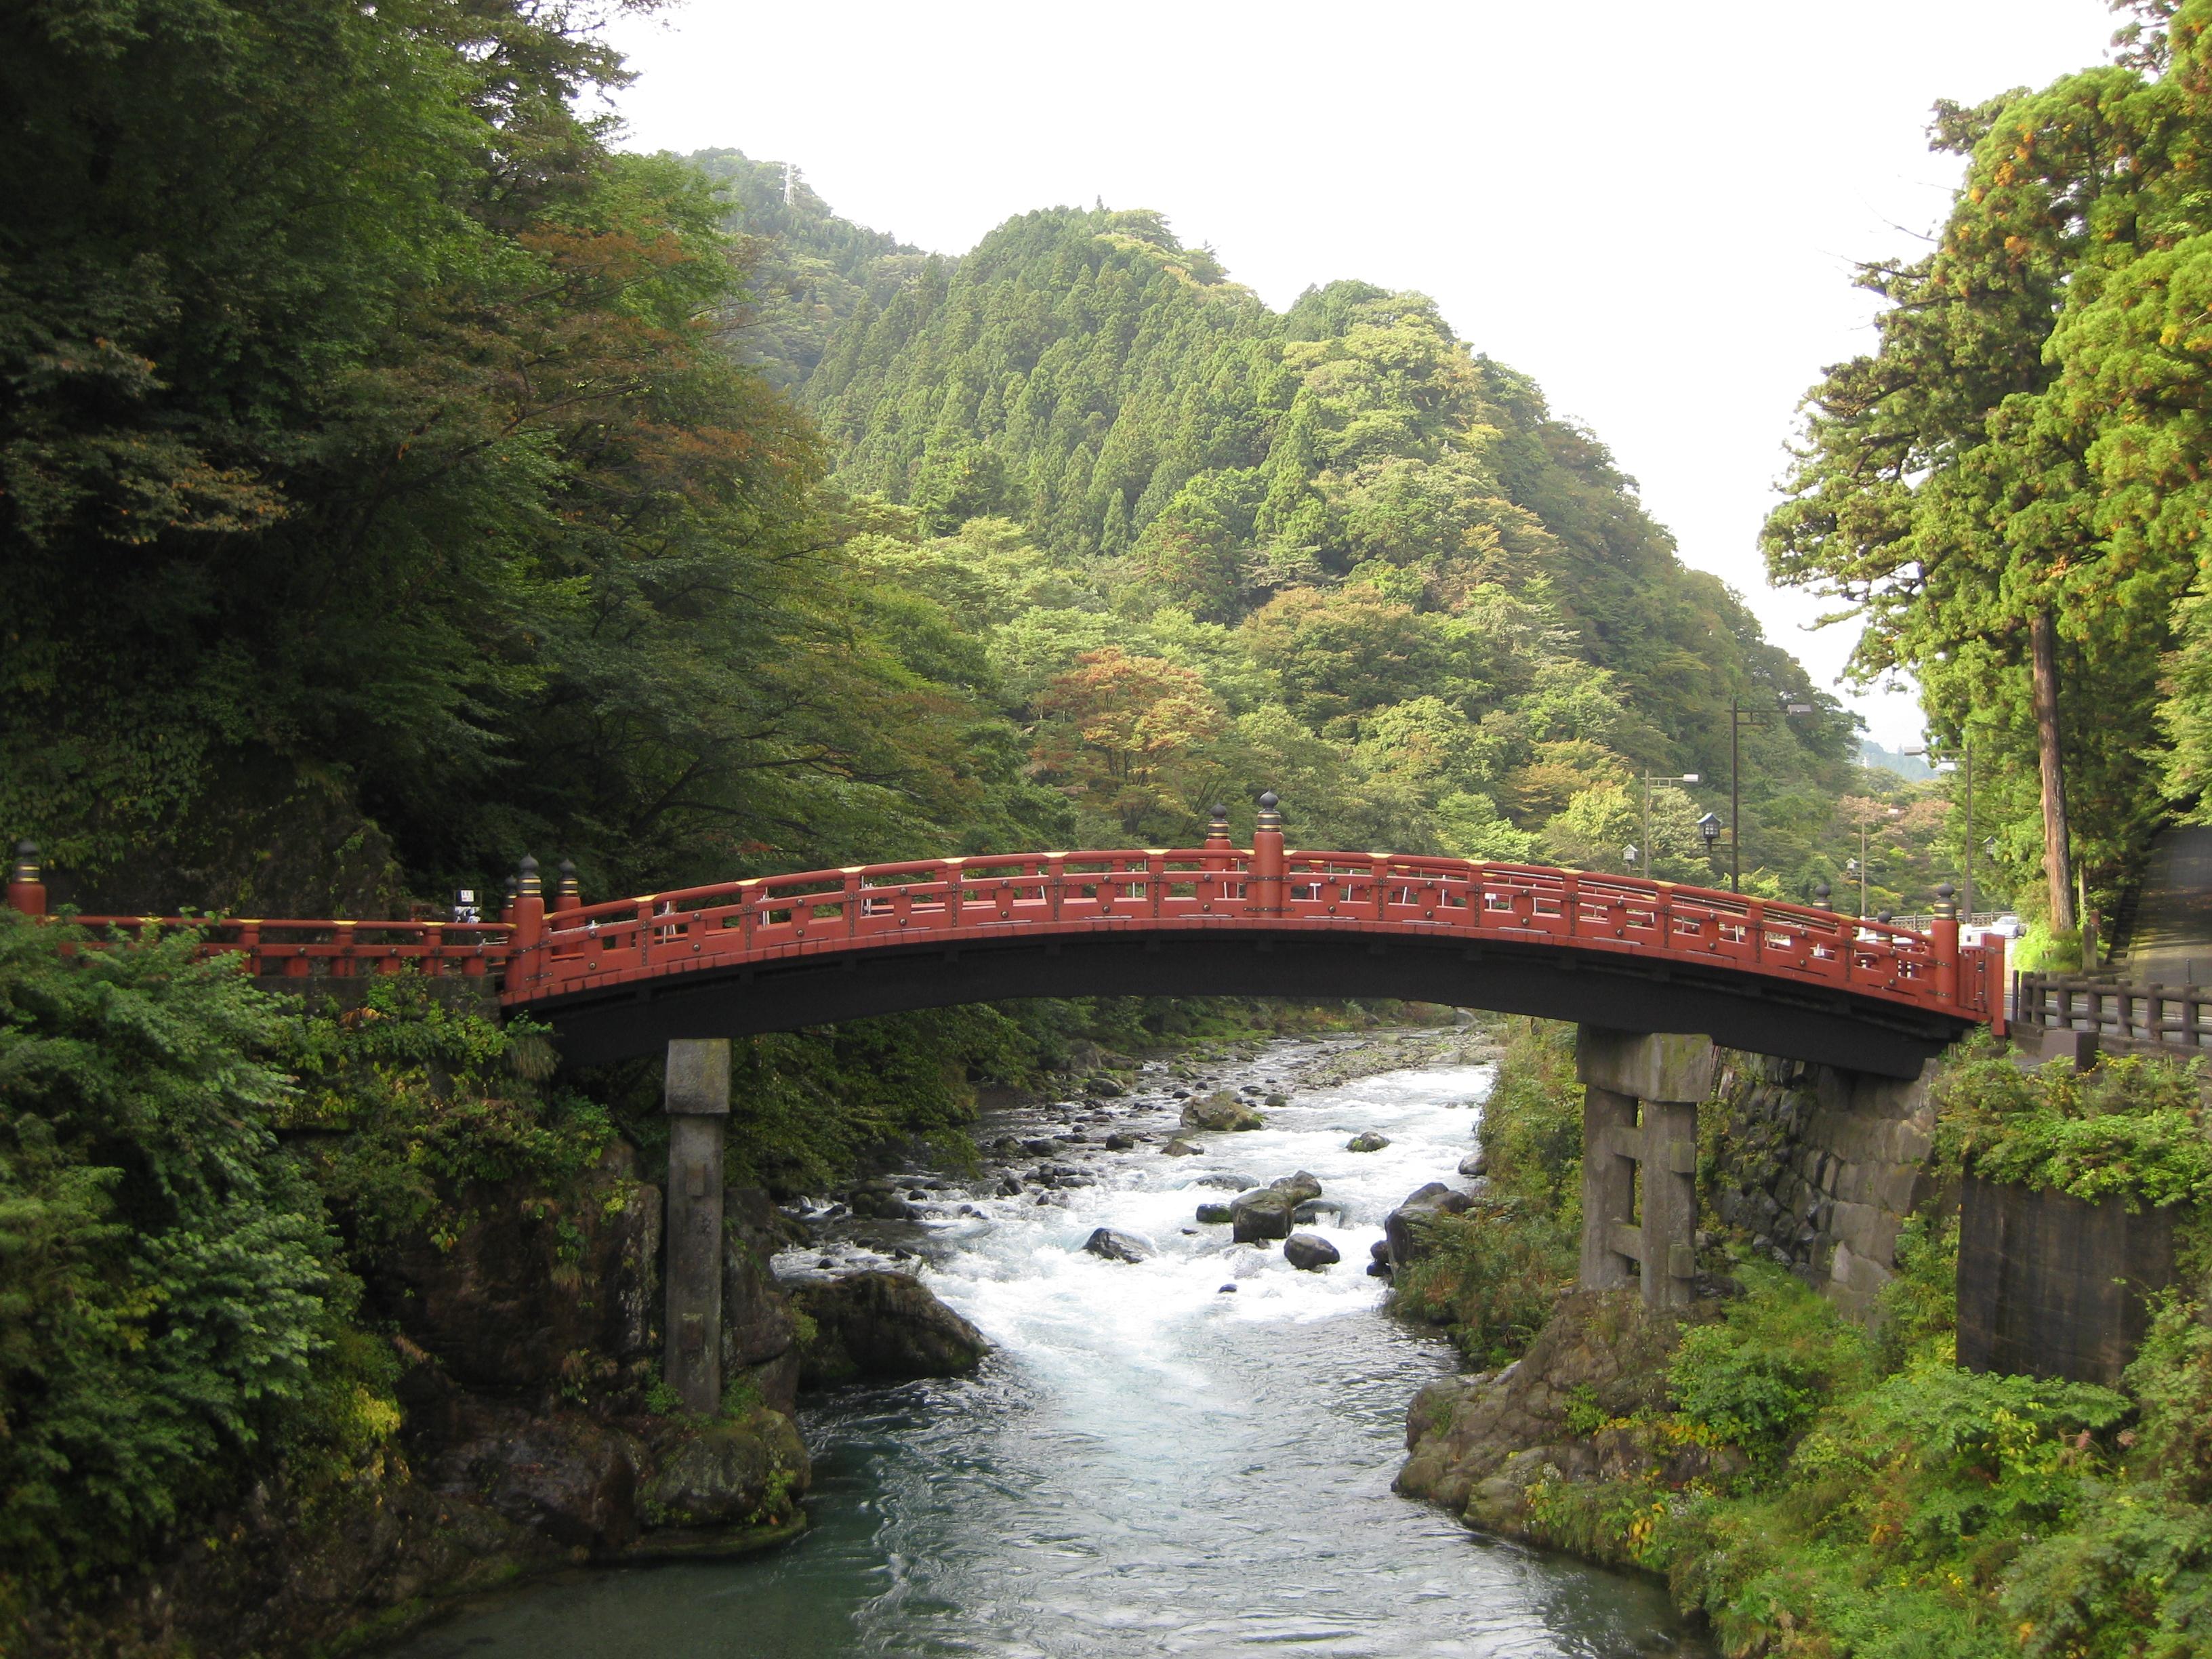 Shinkyo (Sacred Bridge) By Nick-D, via Wikimedia Commons